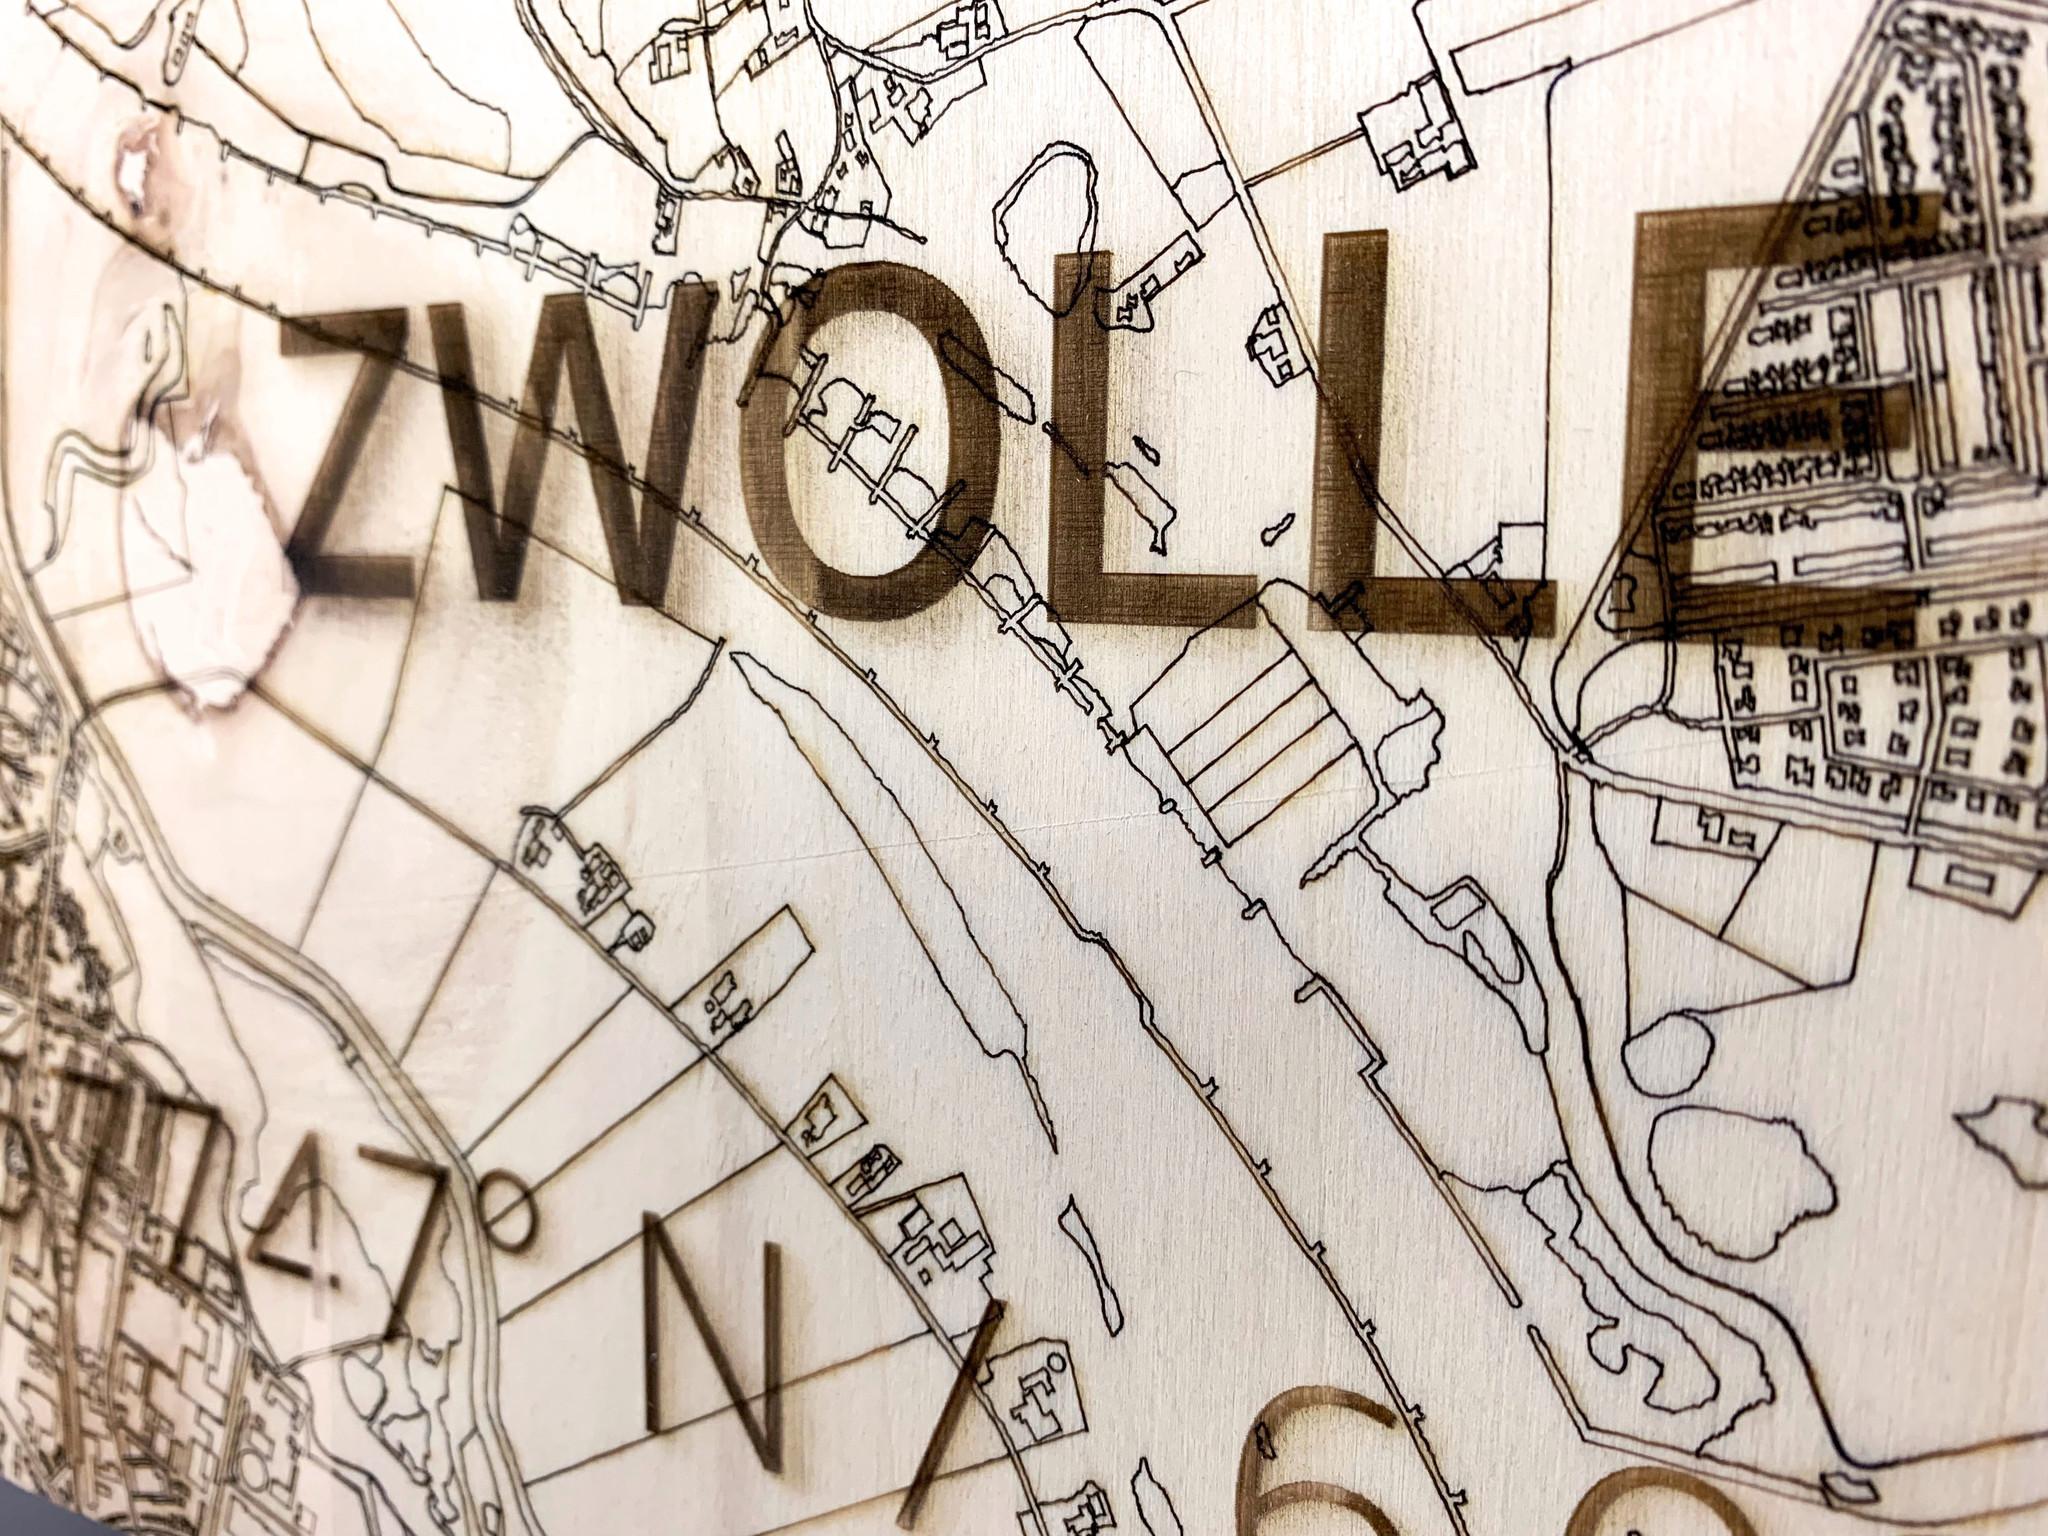 SALE | Zwolle | SALE-3